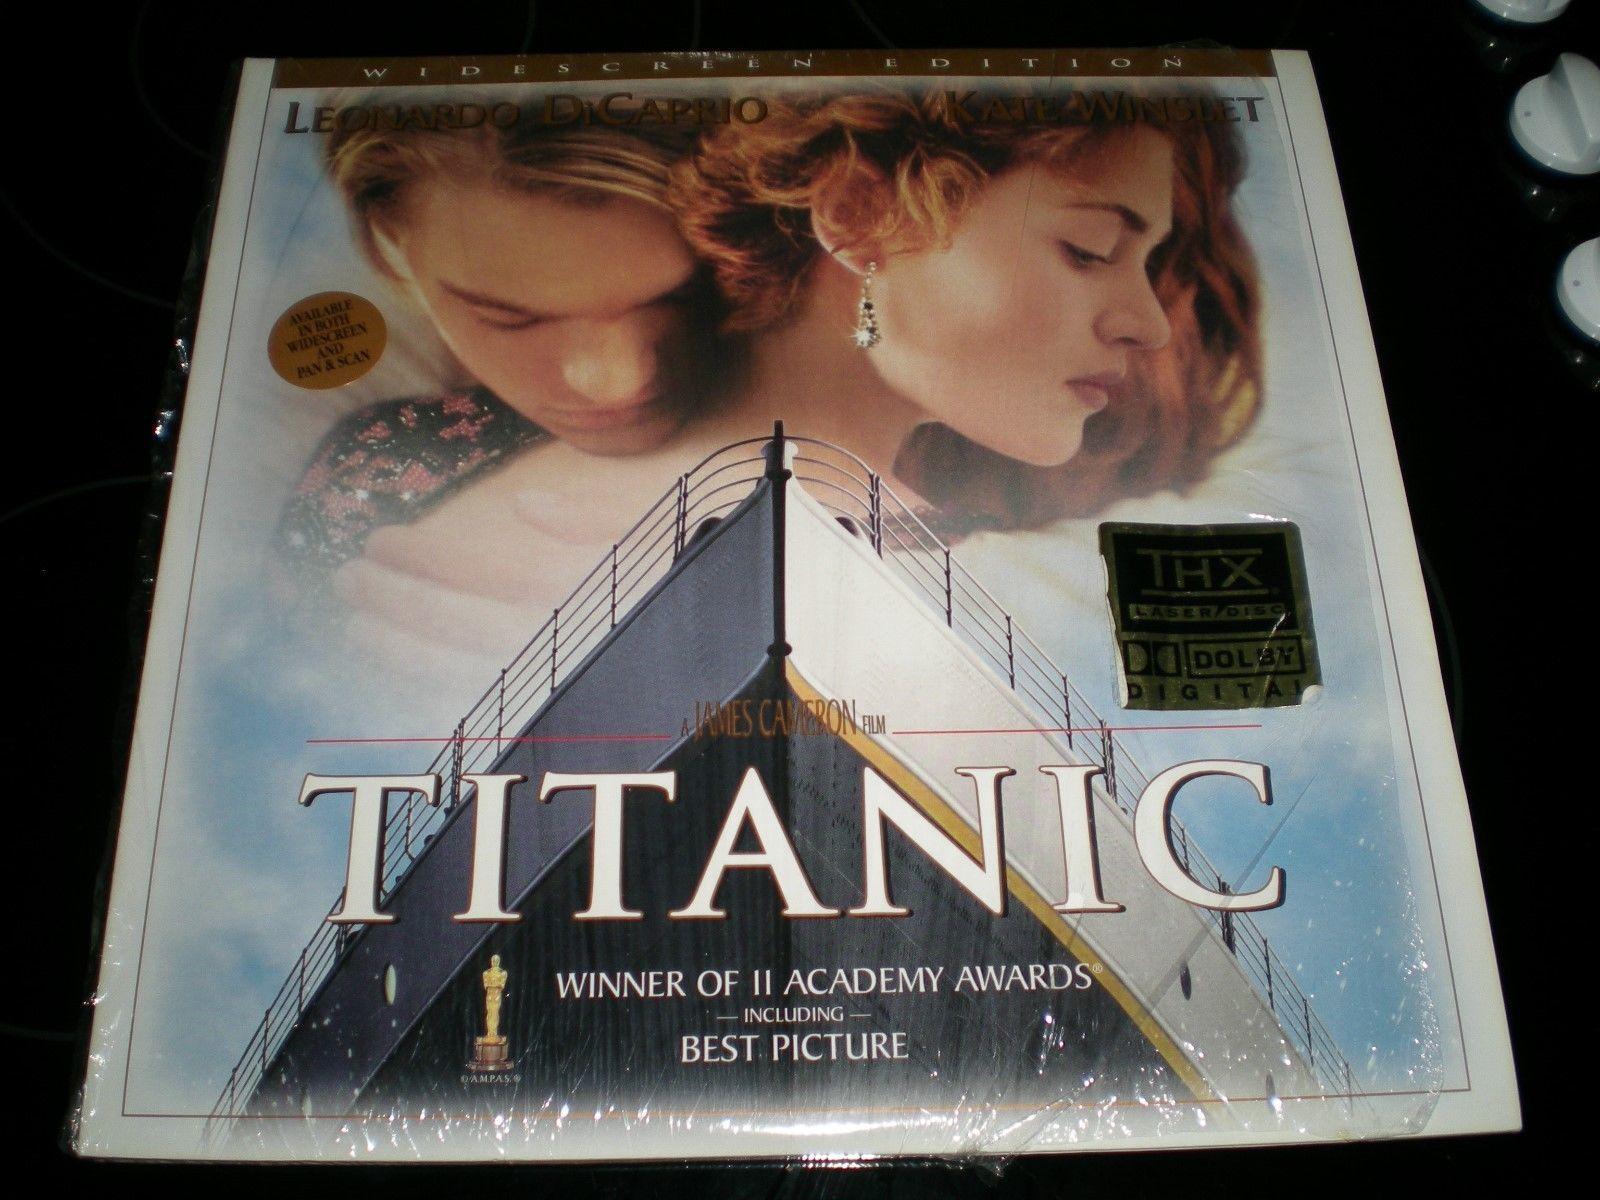 James Cameron - Titanic